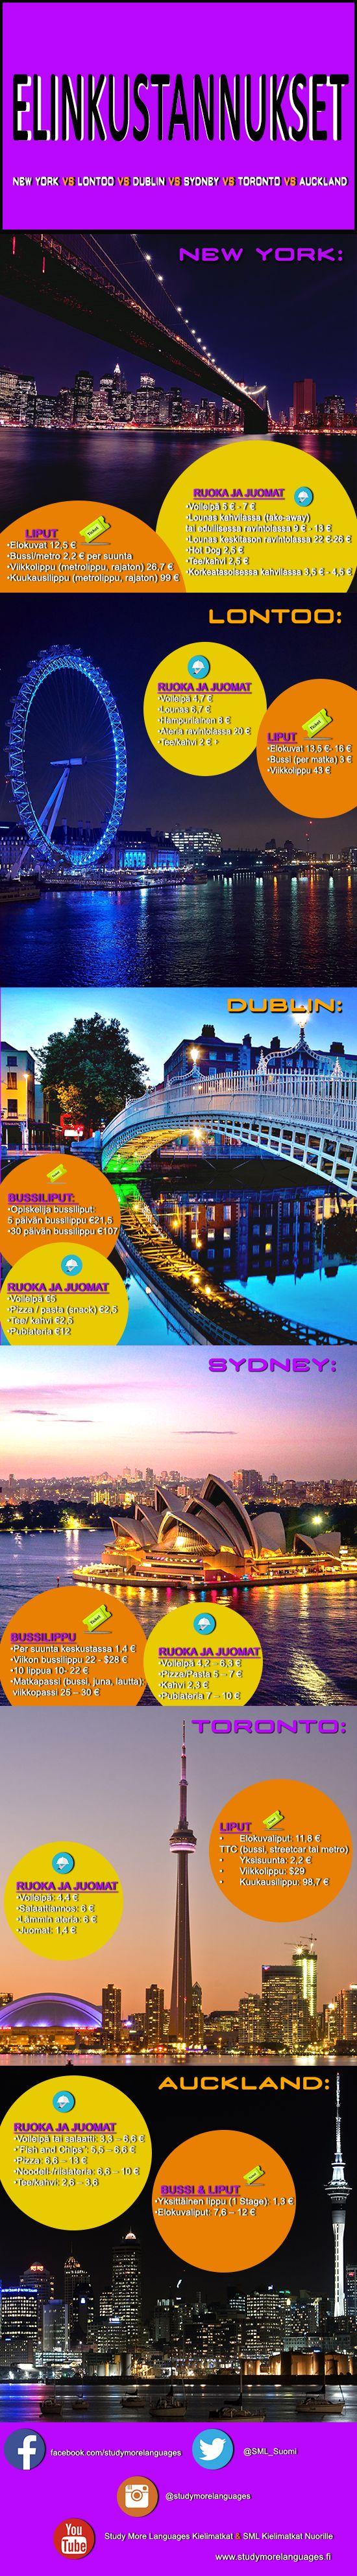 New York vs Lontoo vs Sydney vs Dublin vs Toronto vs Auckland   Vertaile elinkustannuksia kielimatkallasi Lontoossa, New Yorkissa, Sydneyssä, Dublinissa, Torontossa sekä Aucklandissa.  #SMLMatka #Kielimatkat